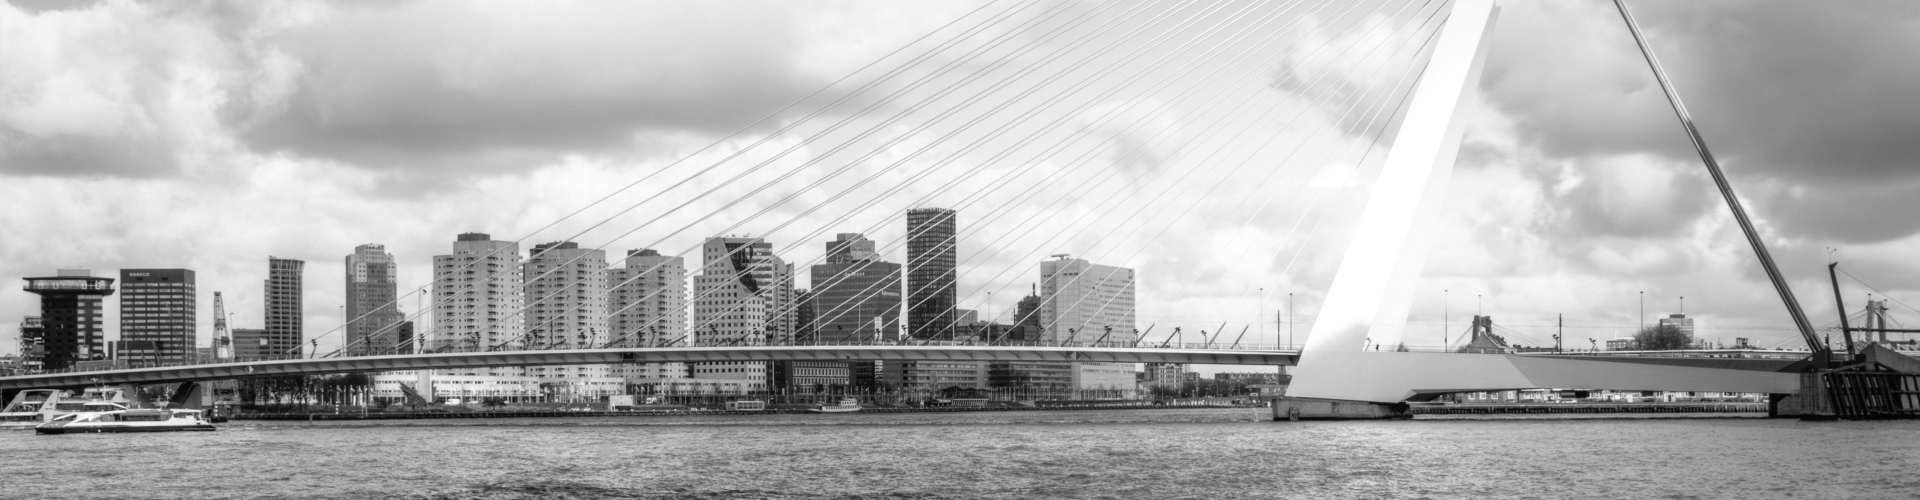 Rotterdamse Pakketten Skyline Erasmusbrug